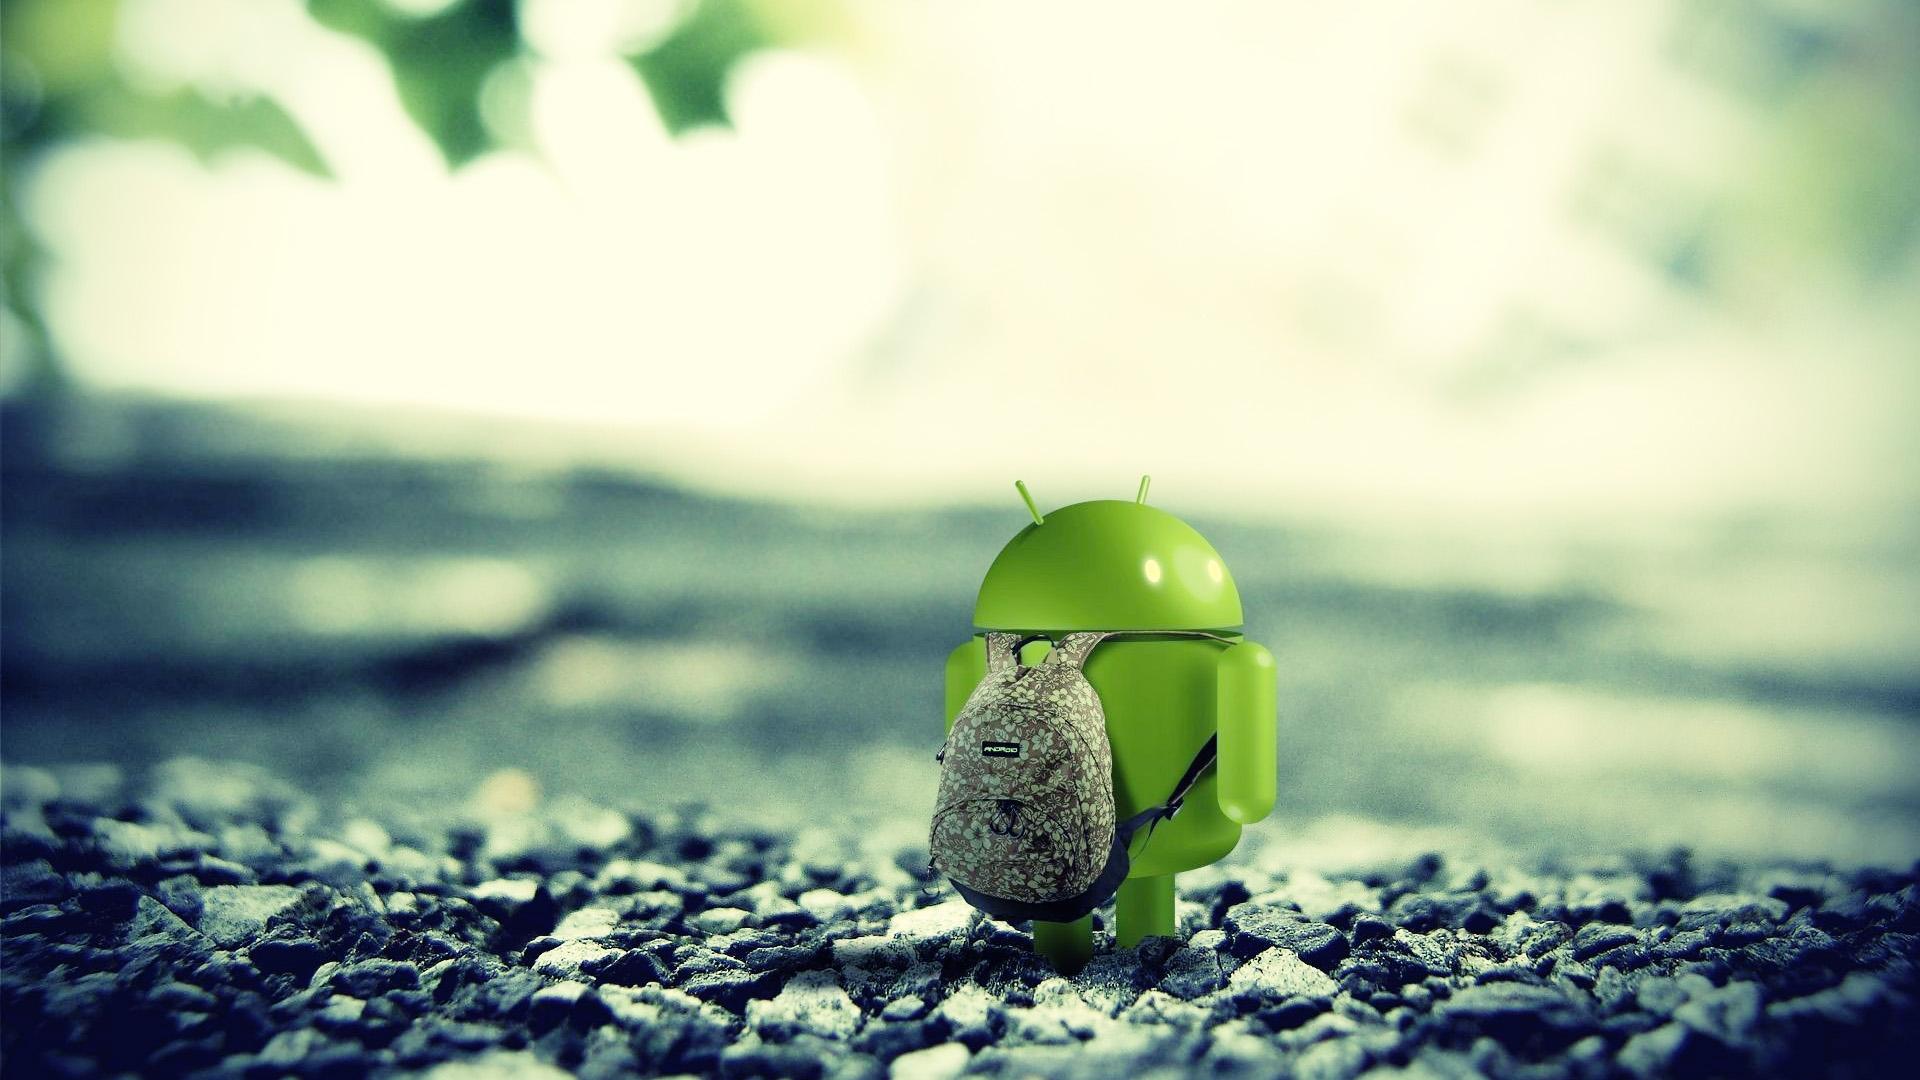 Android wallpaper - Bild 6 13 Android Wallpaper Android Wallpaper Android Wallpaper Bild